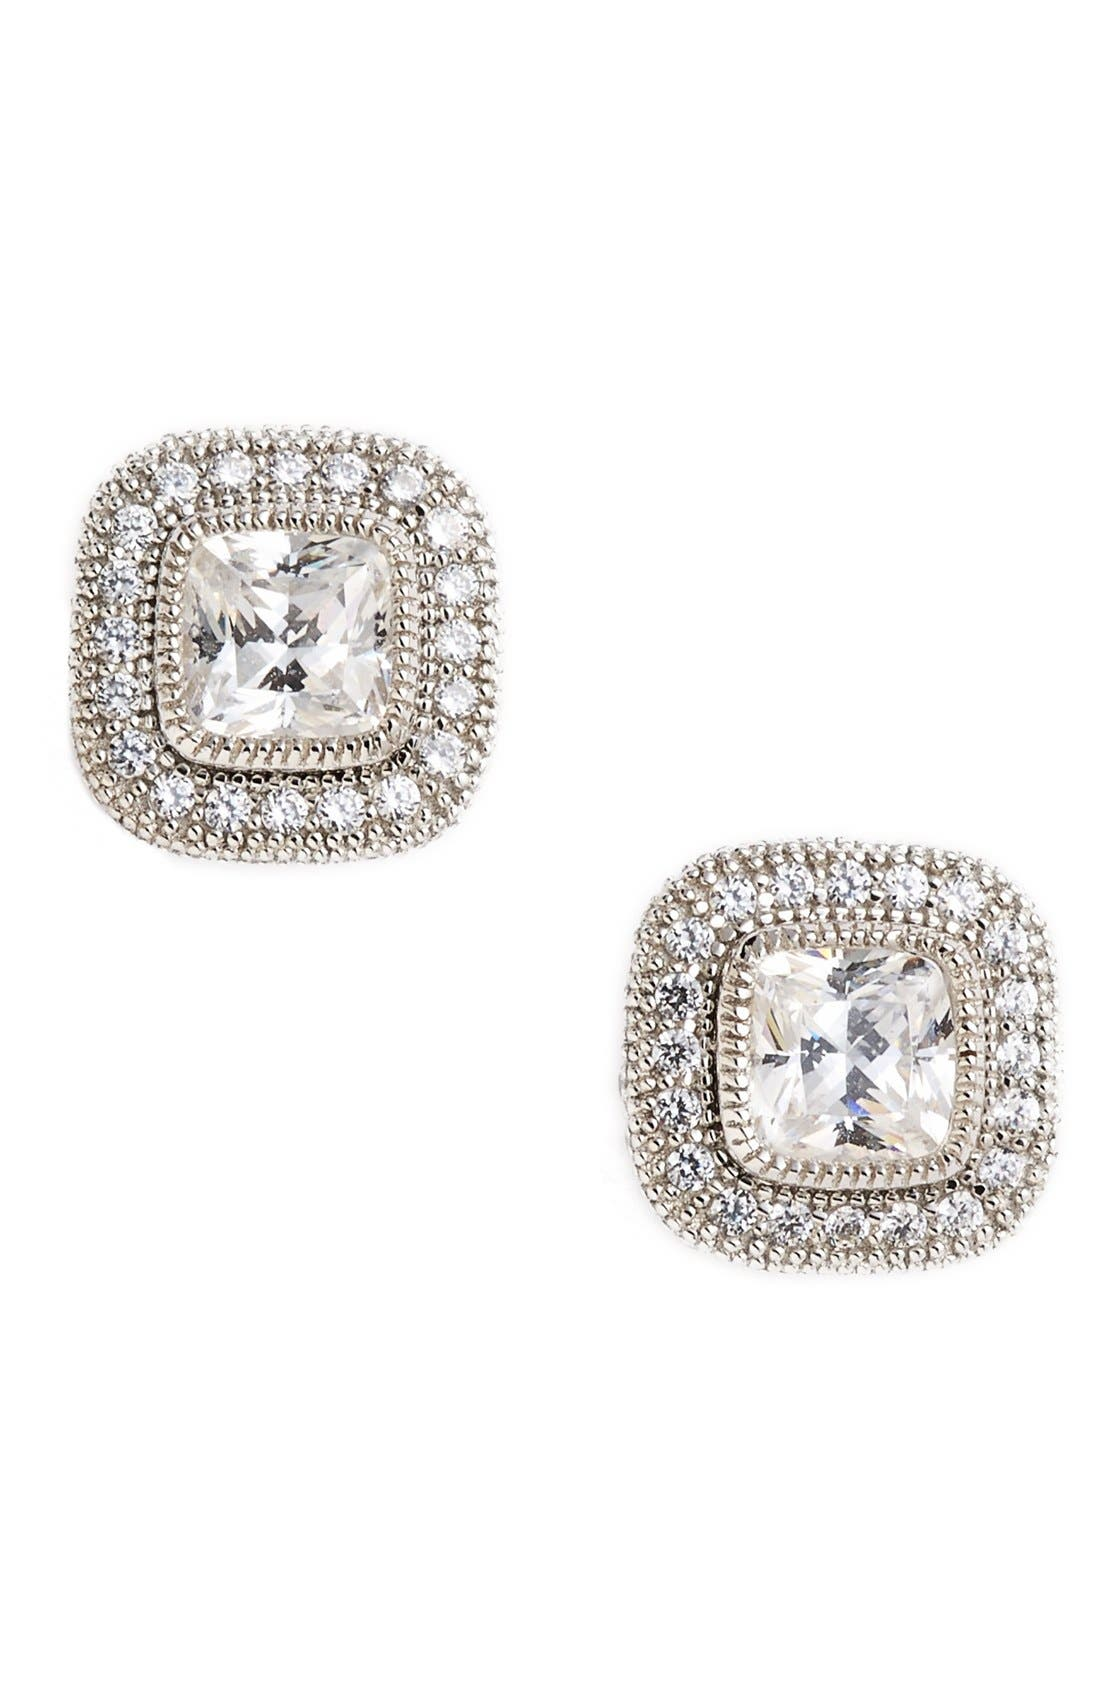 Lafonn'Lassaire' Square Stud Earrings